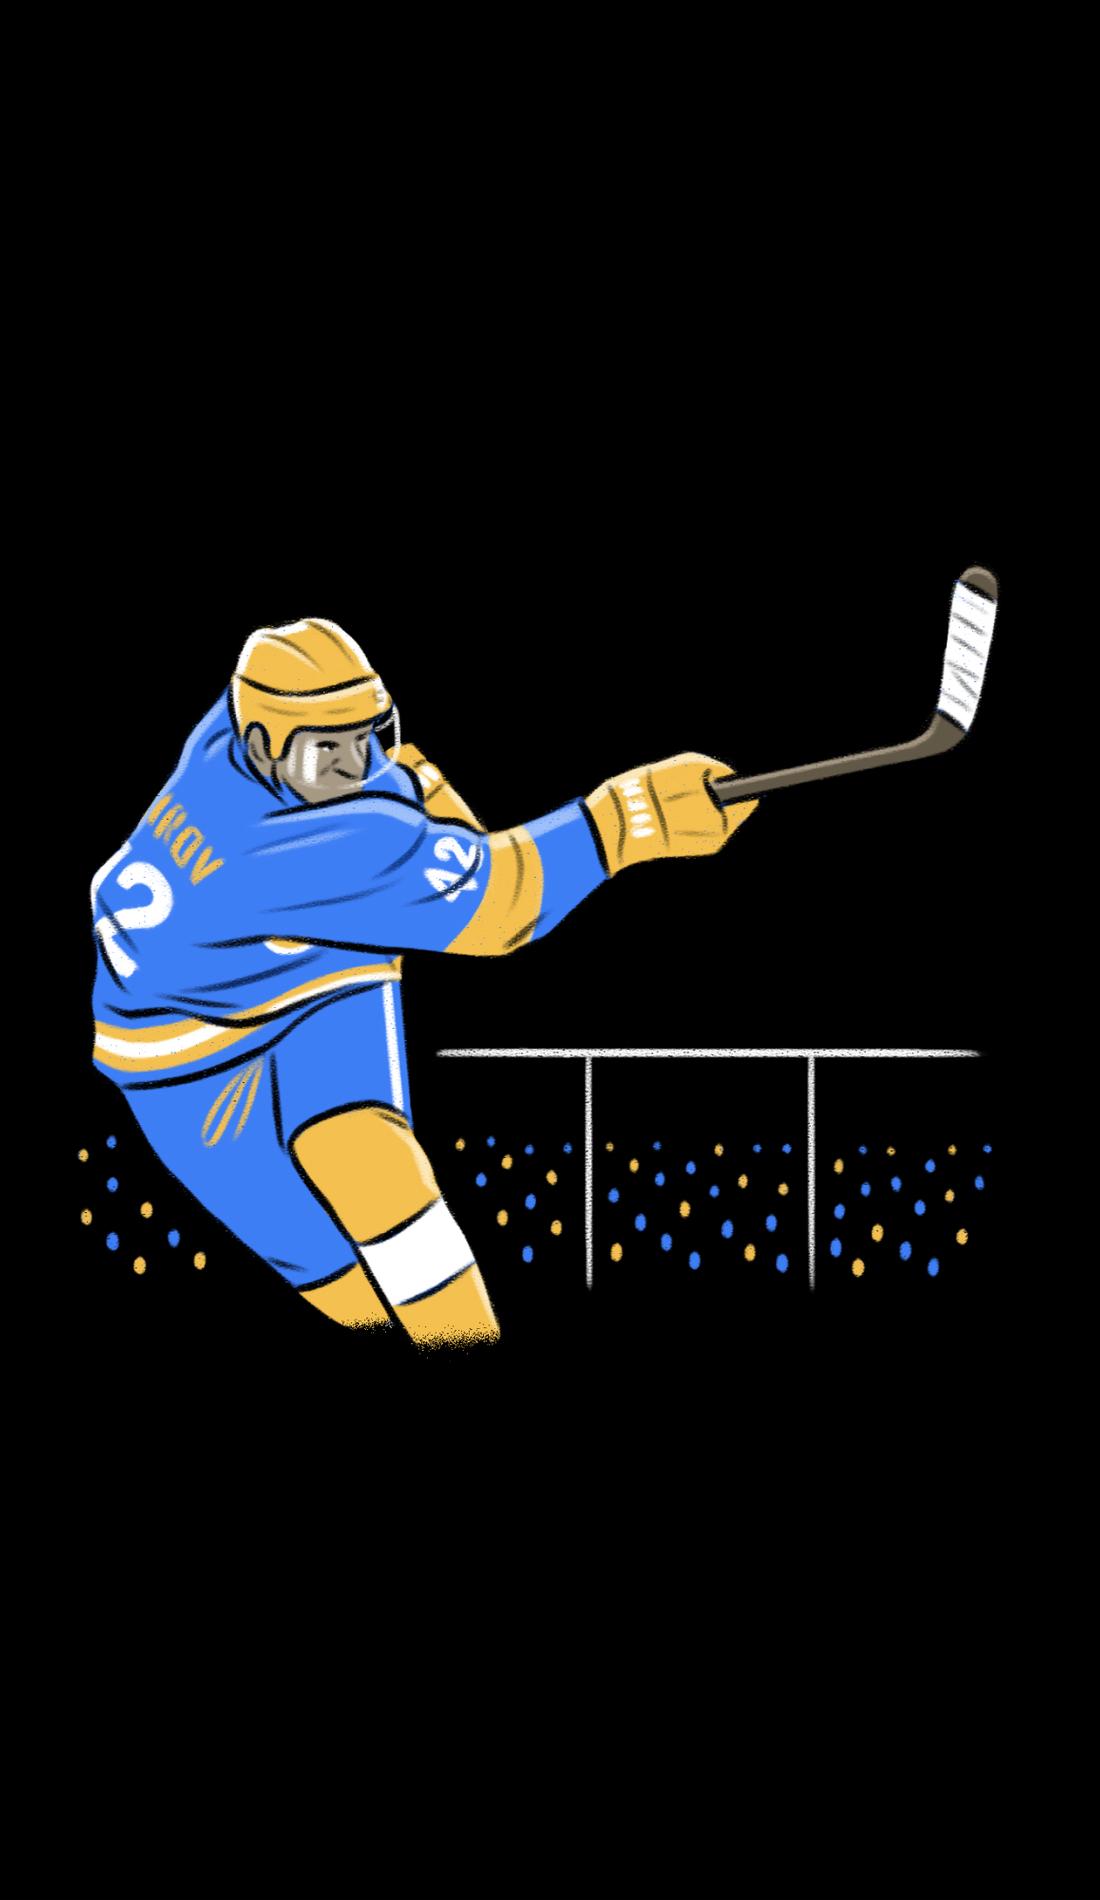 A Boston University Terriers Hockey live event